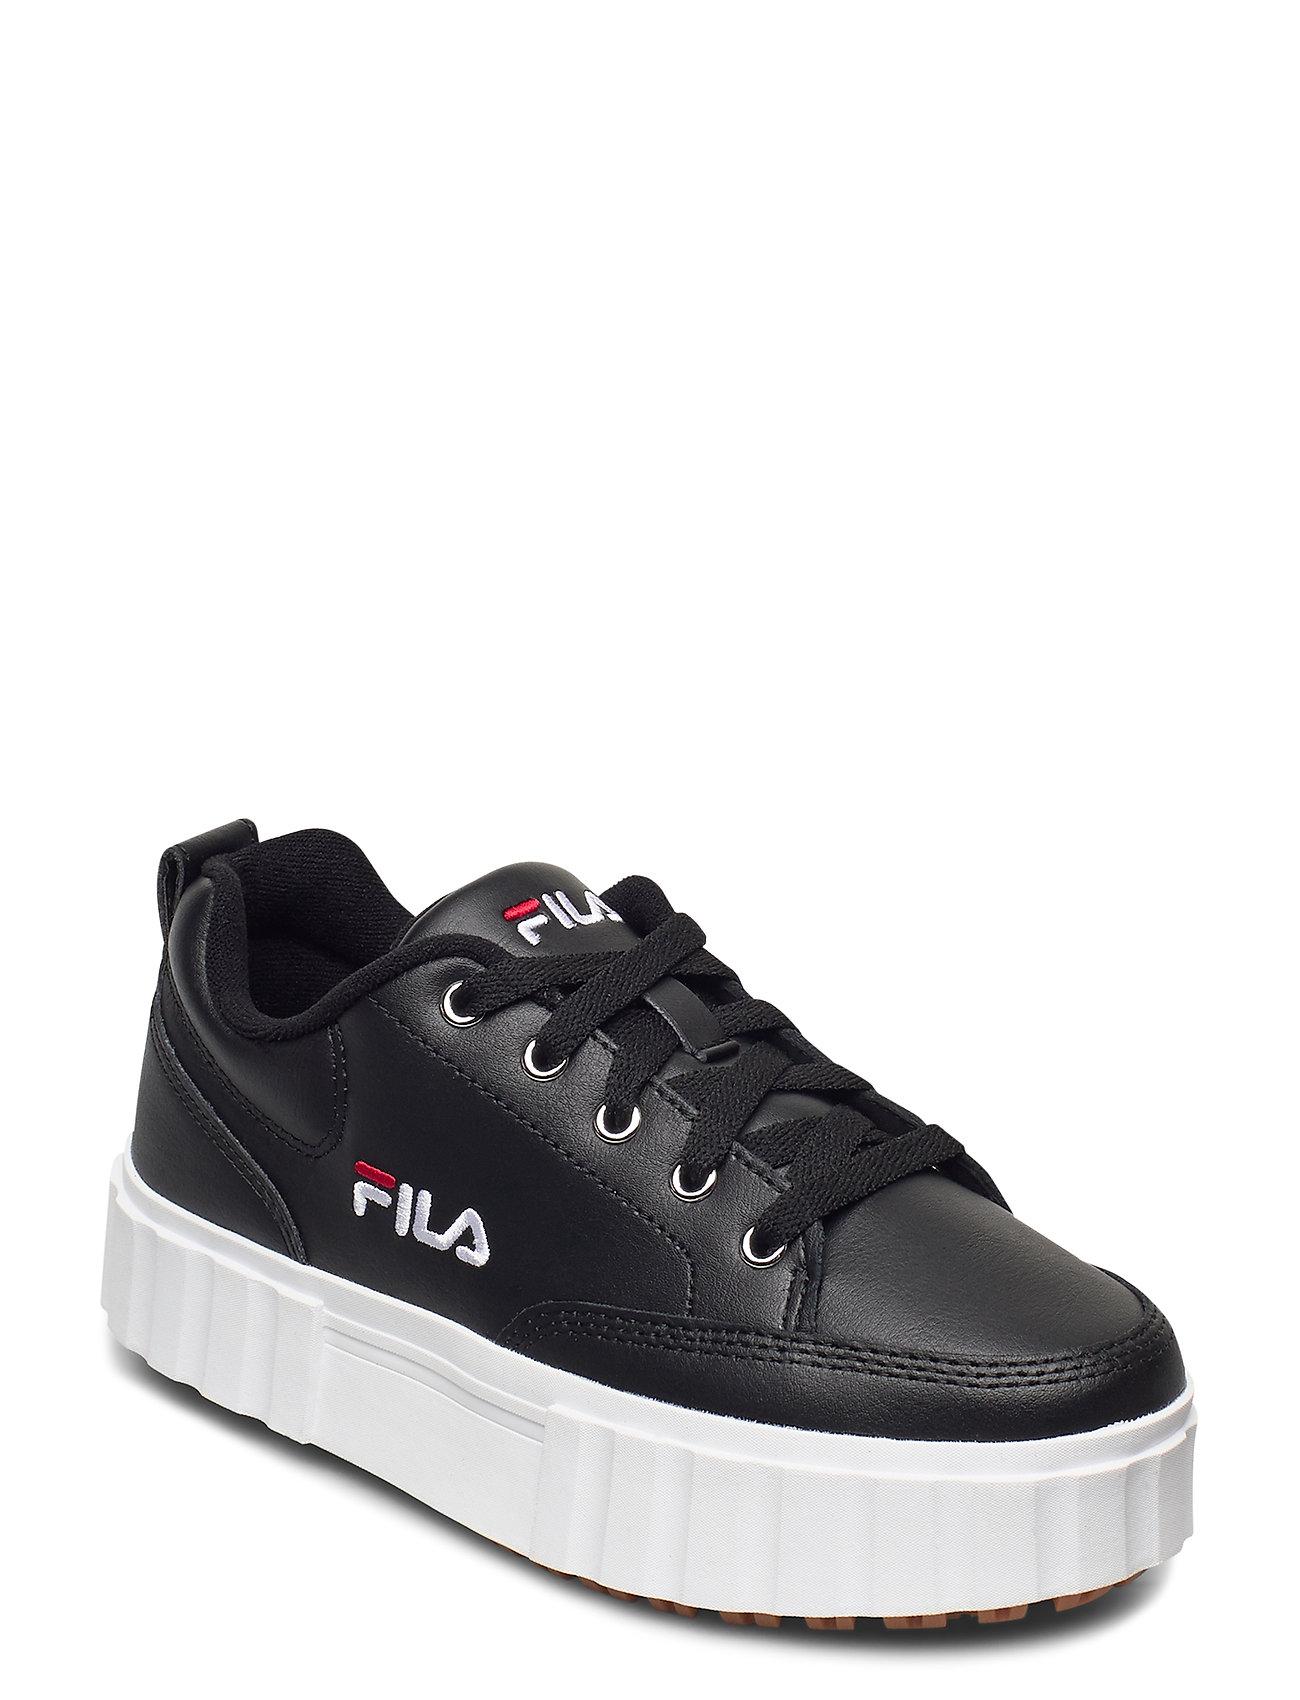 Image of Sandblast L Wmn Low-top Sneakers Sort FILA (3456635365)